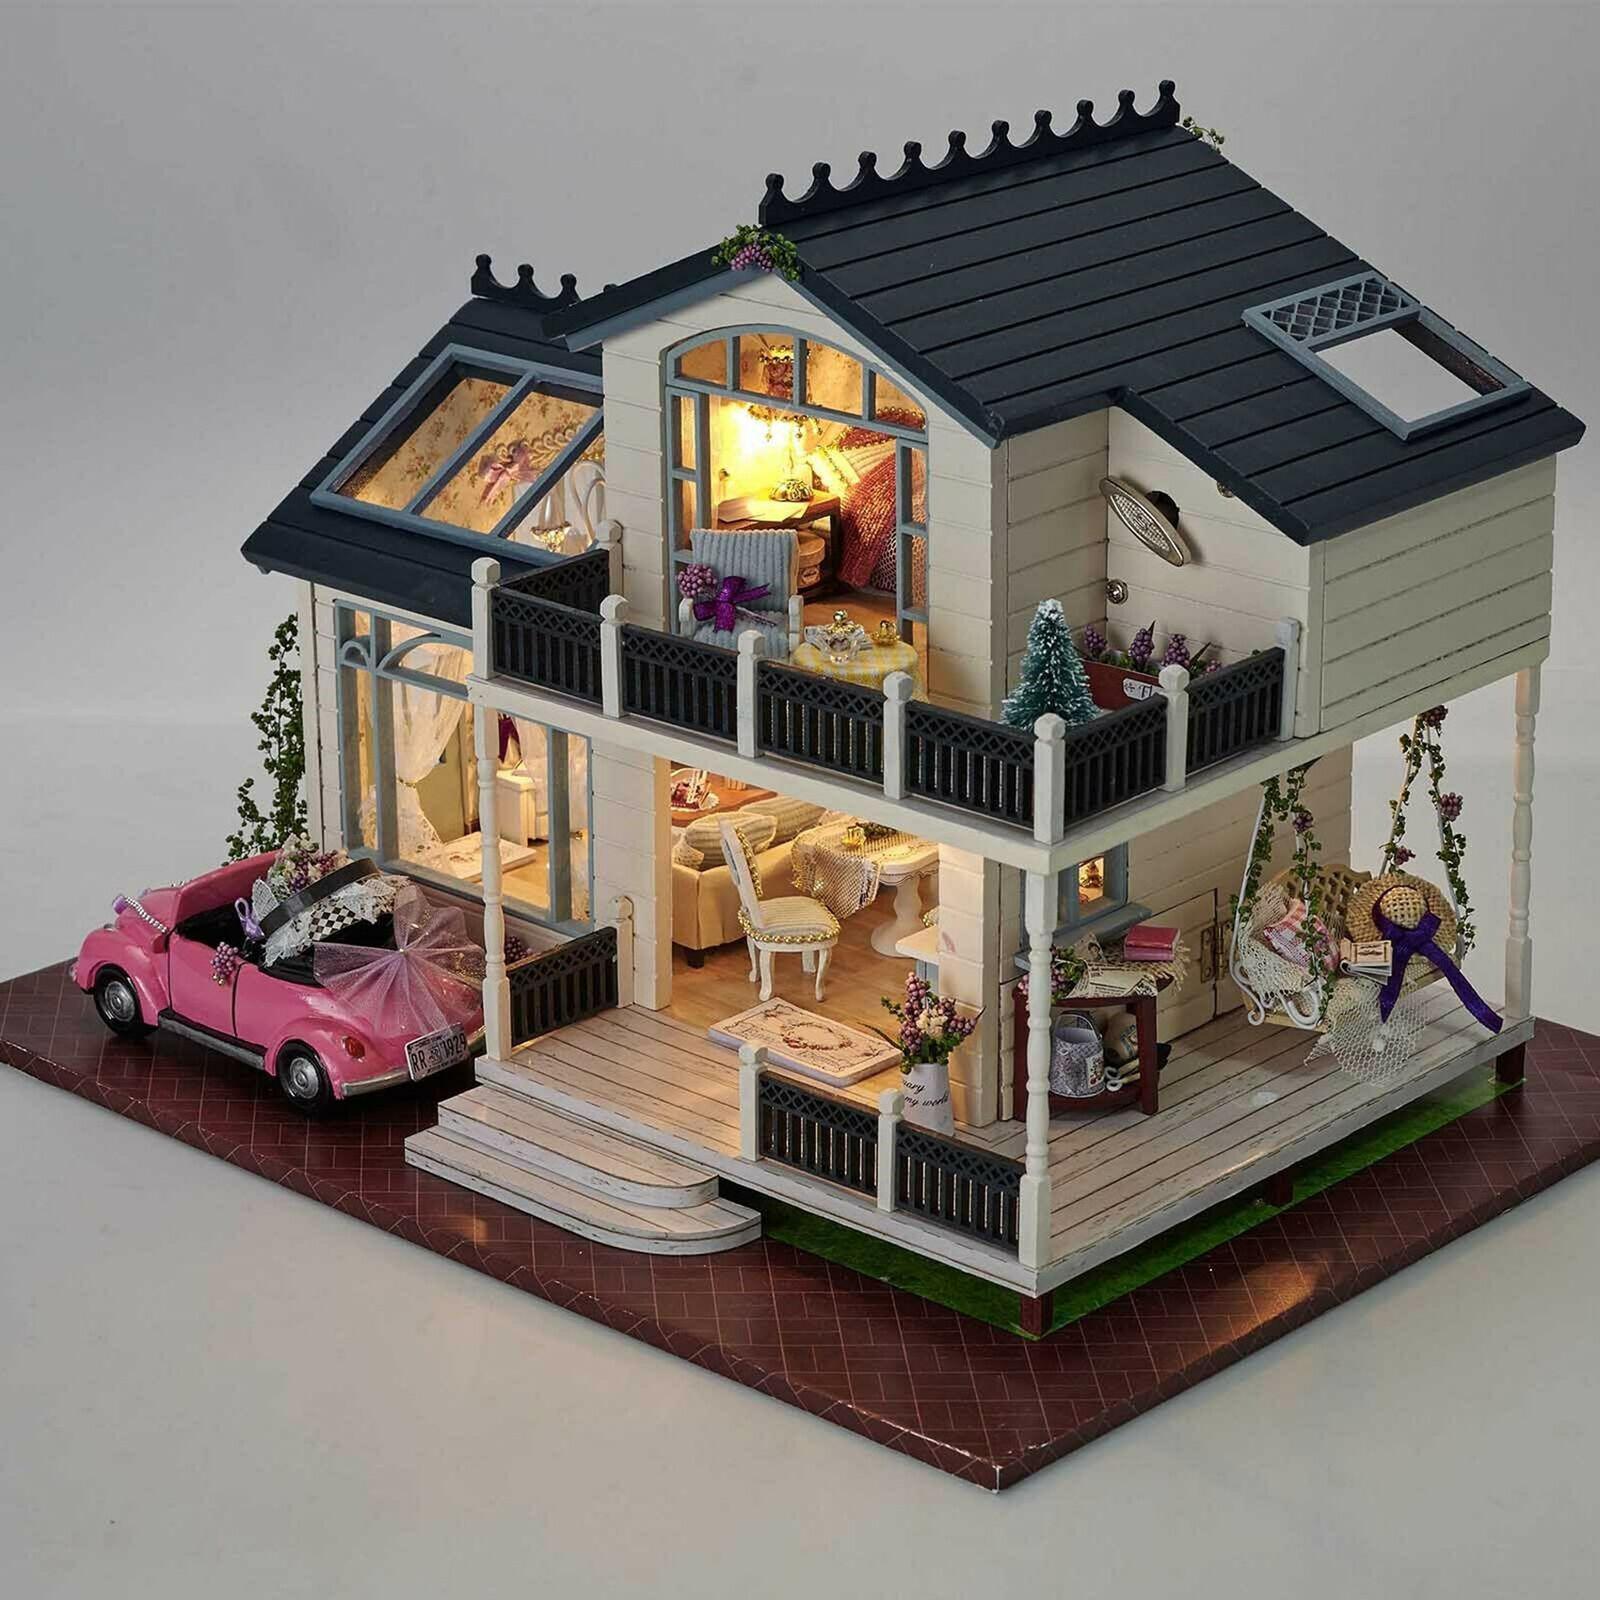 DIY Handcraft Miniature Project Kit My Pink Sweetheart Villa Wooden Dolls House